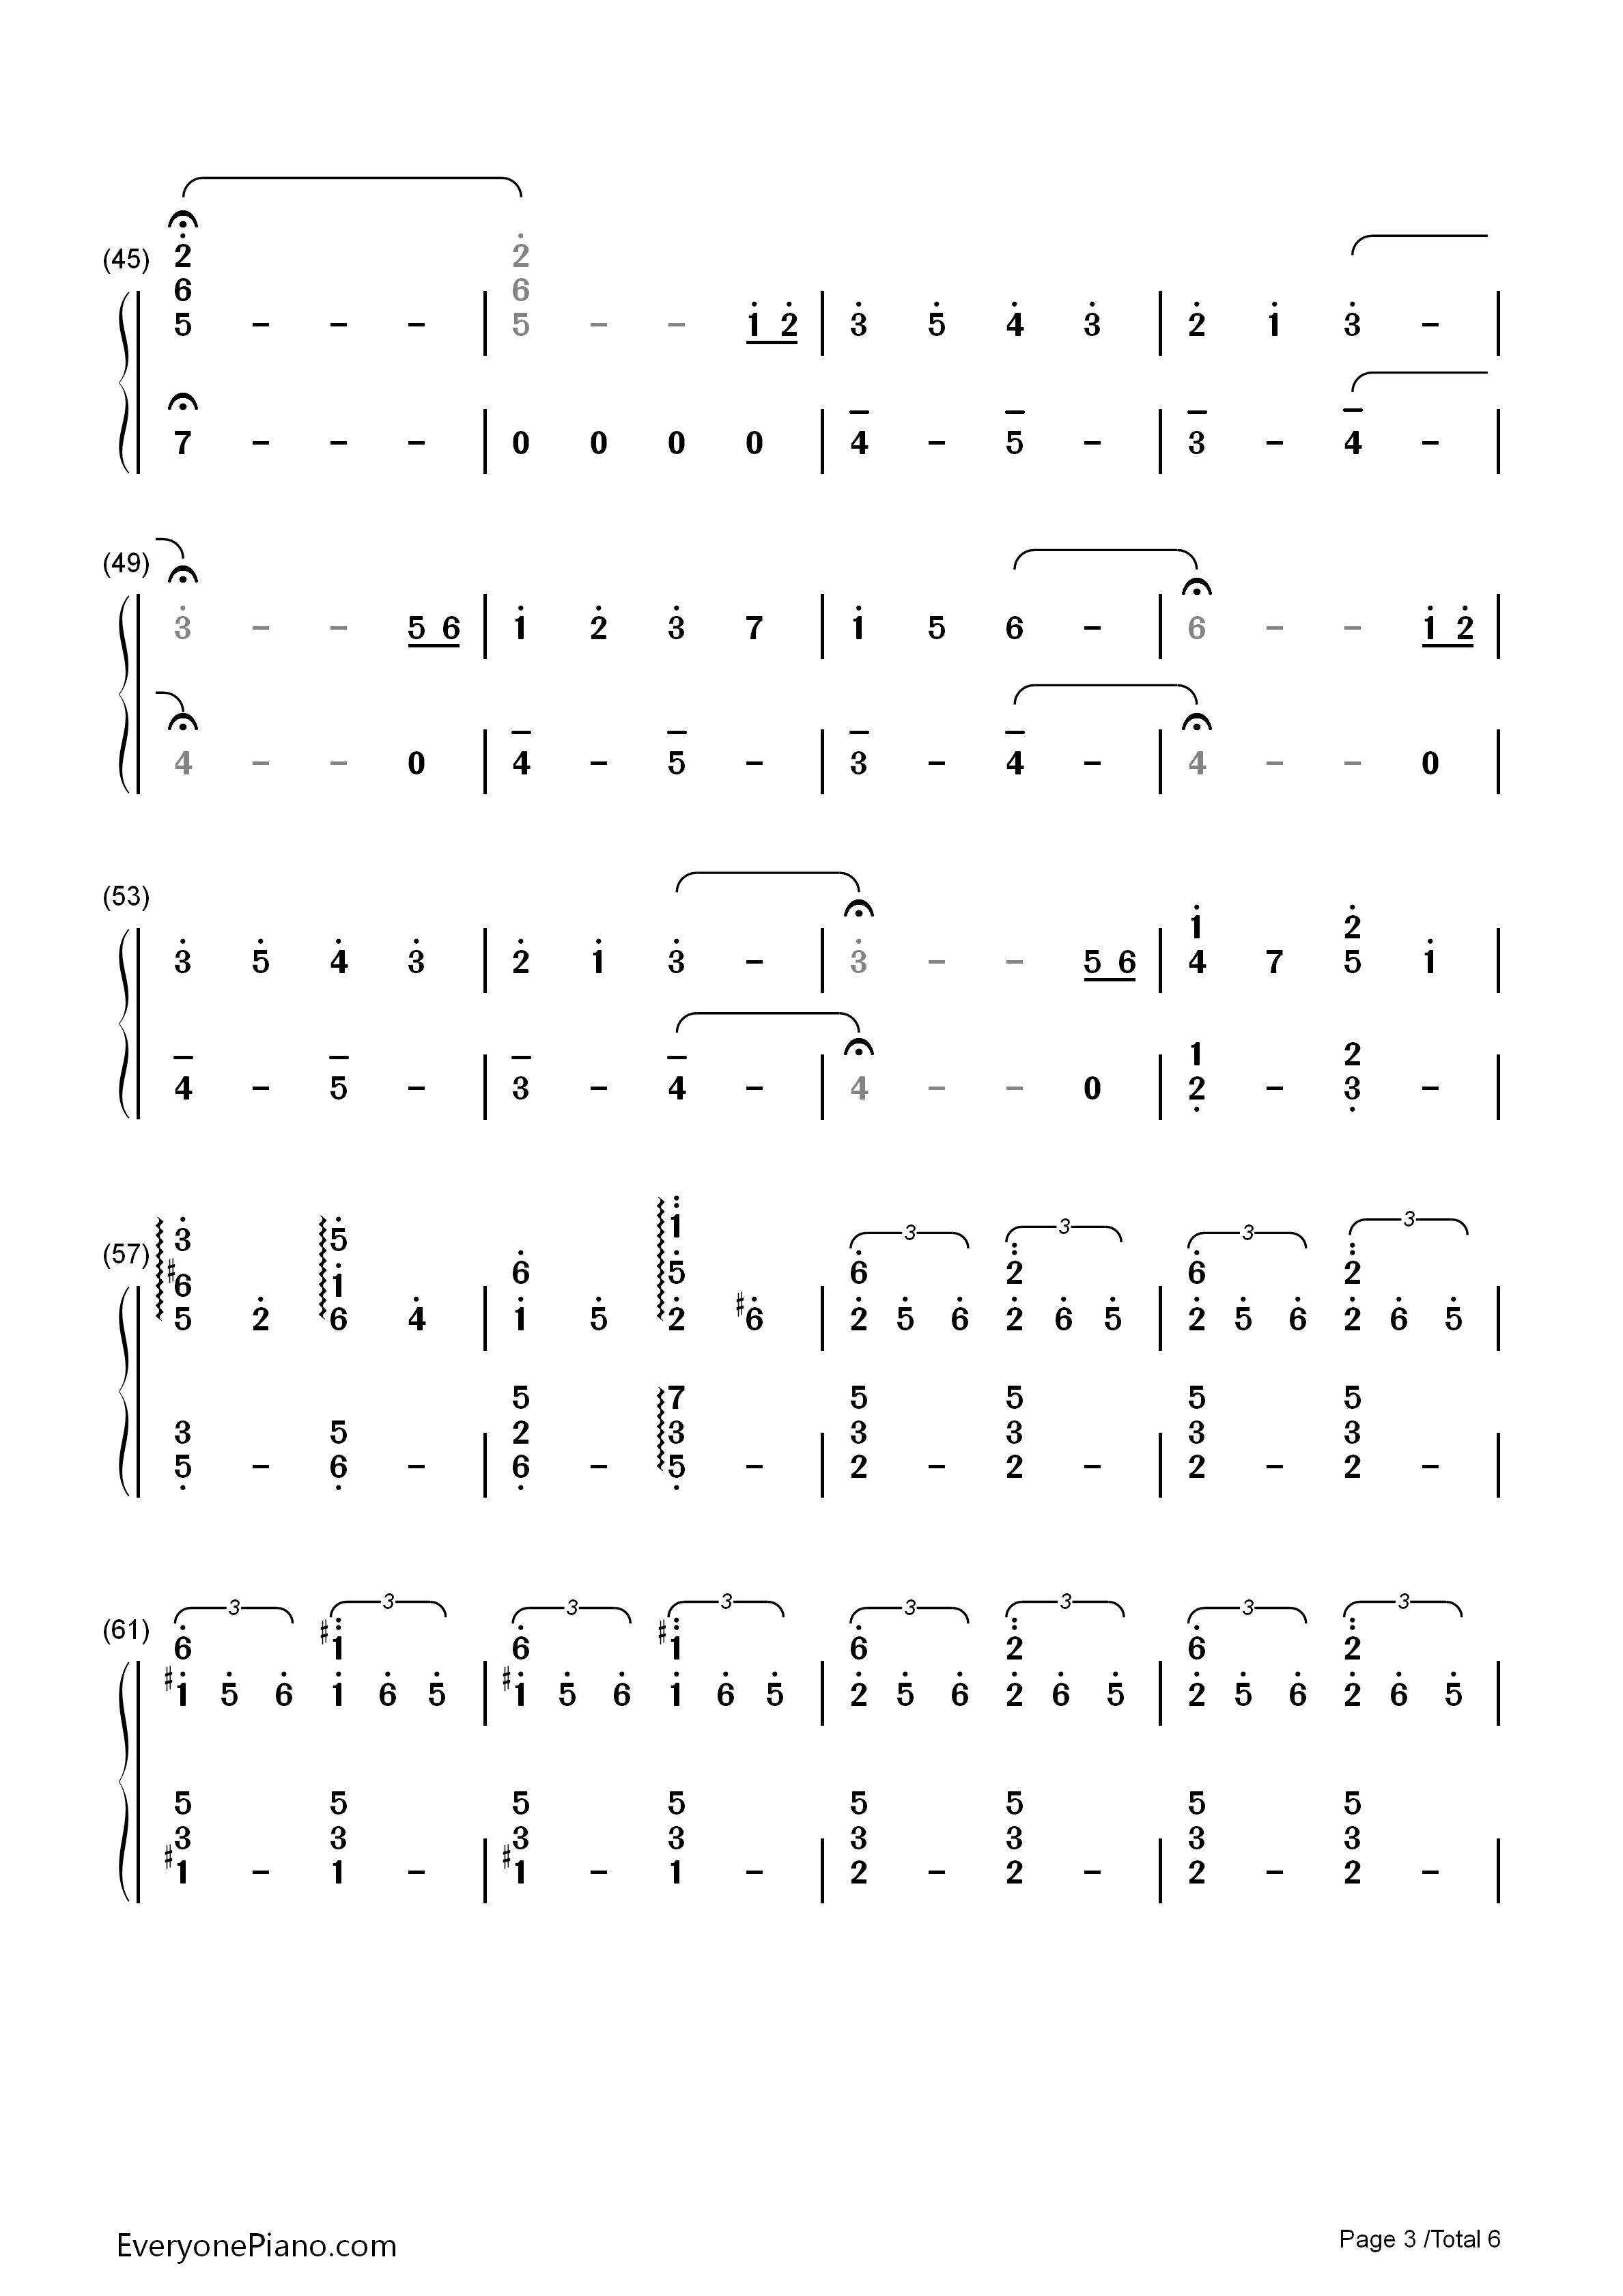 nandemonaiya sheet music